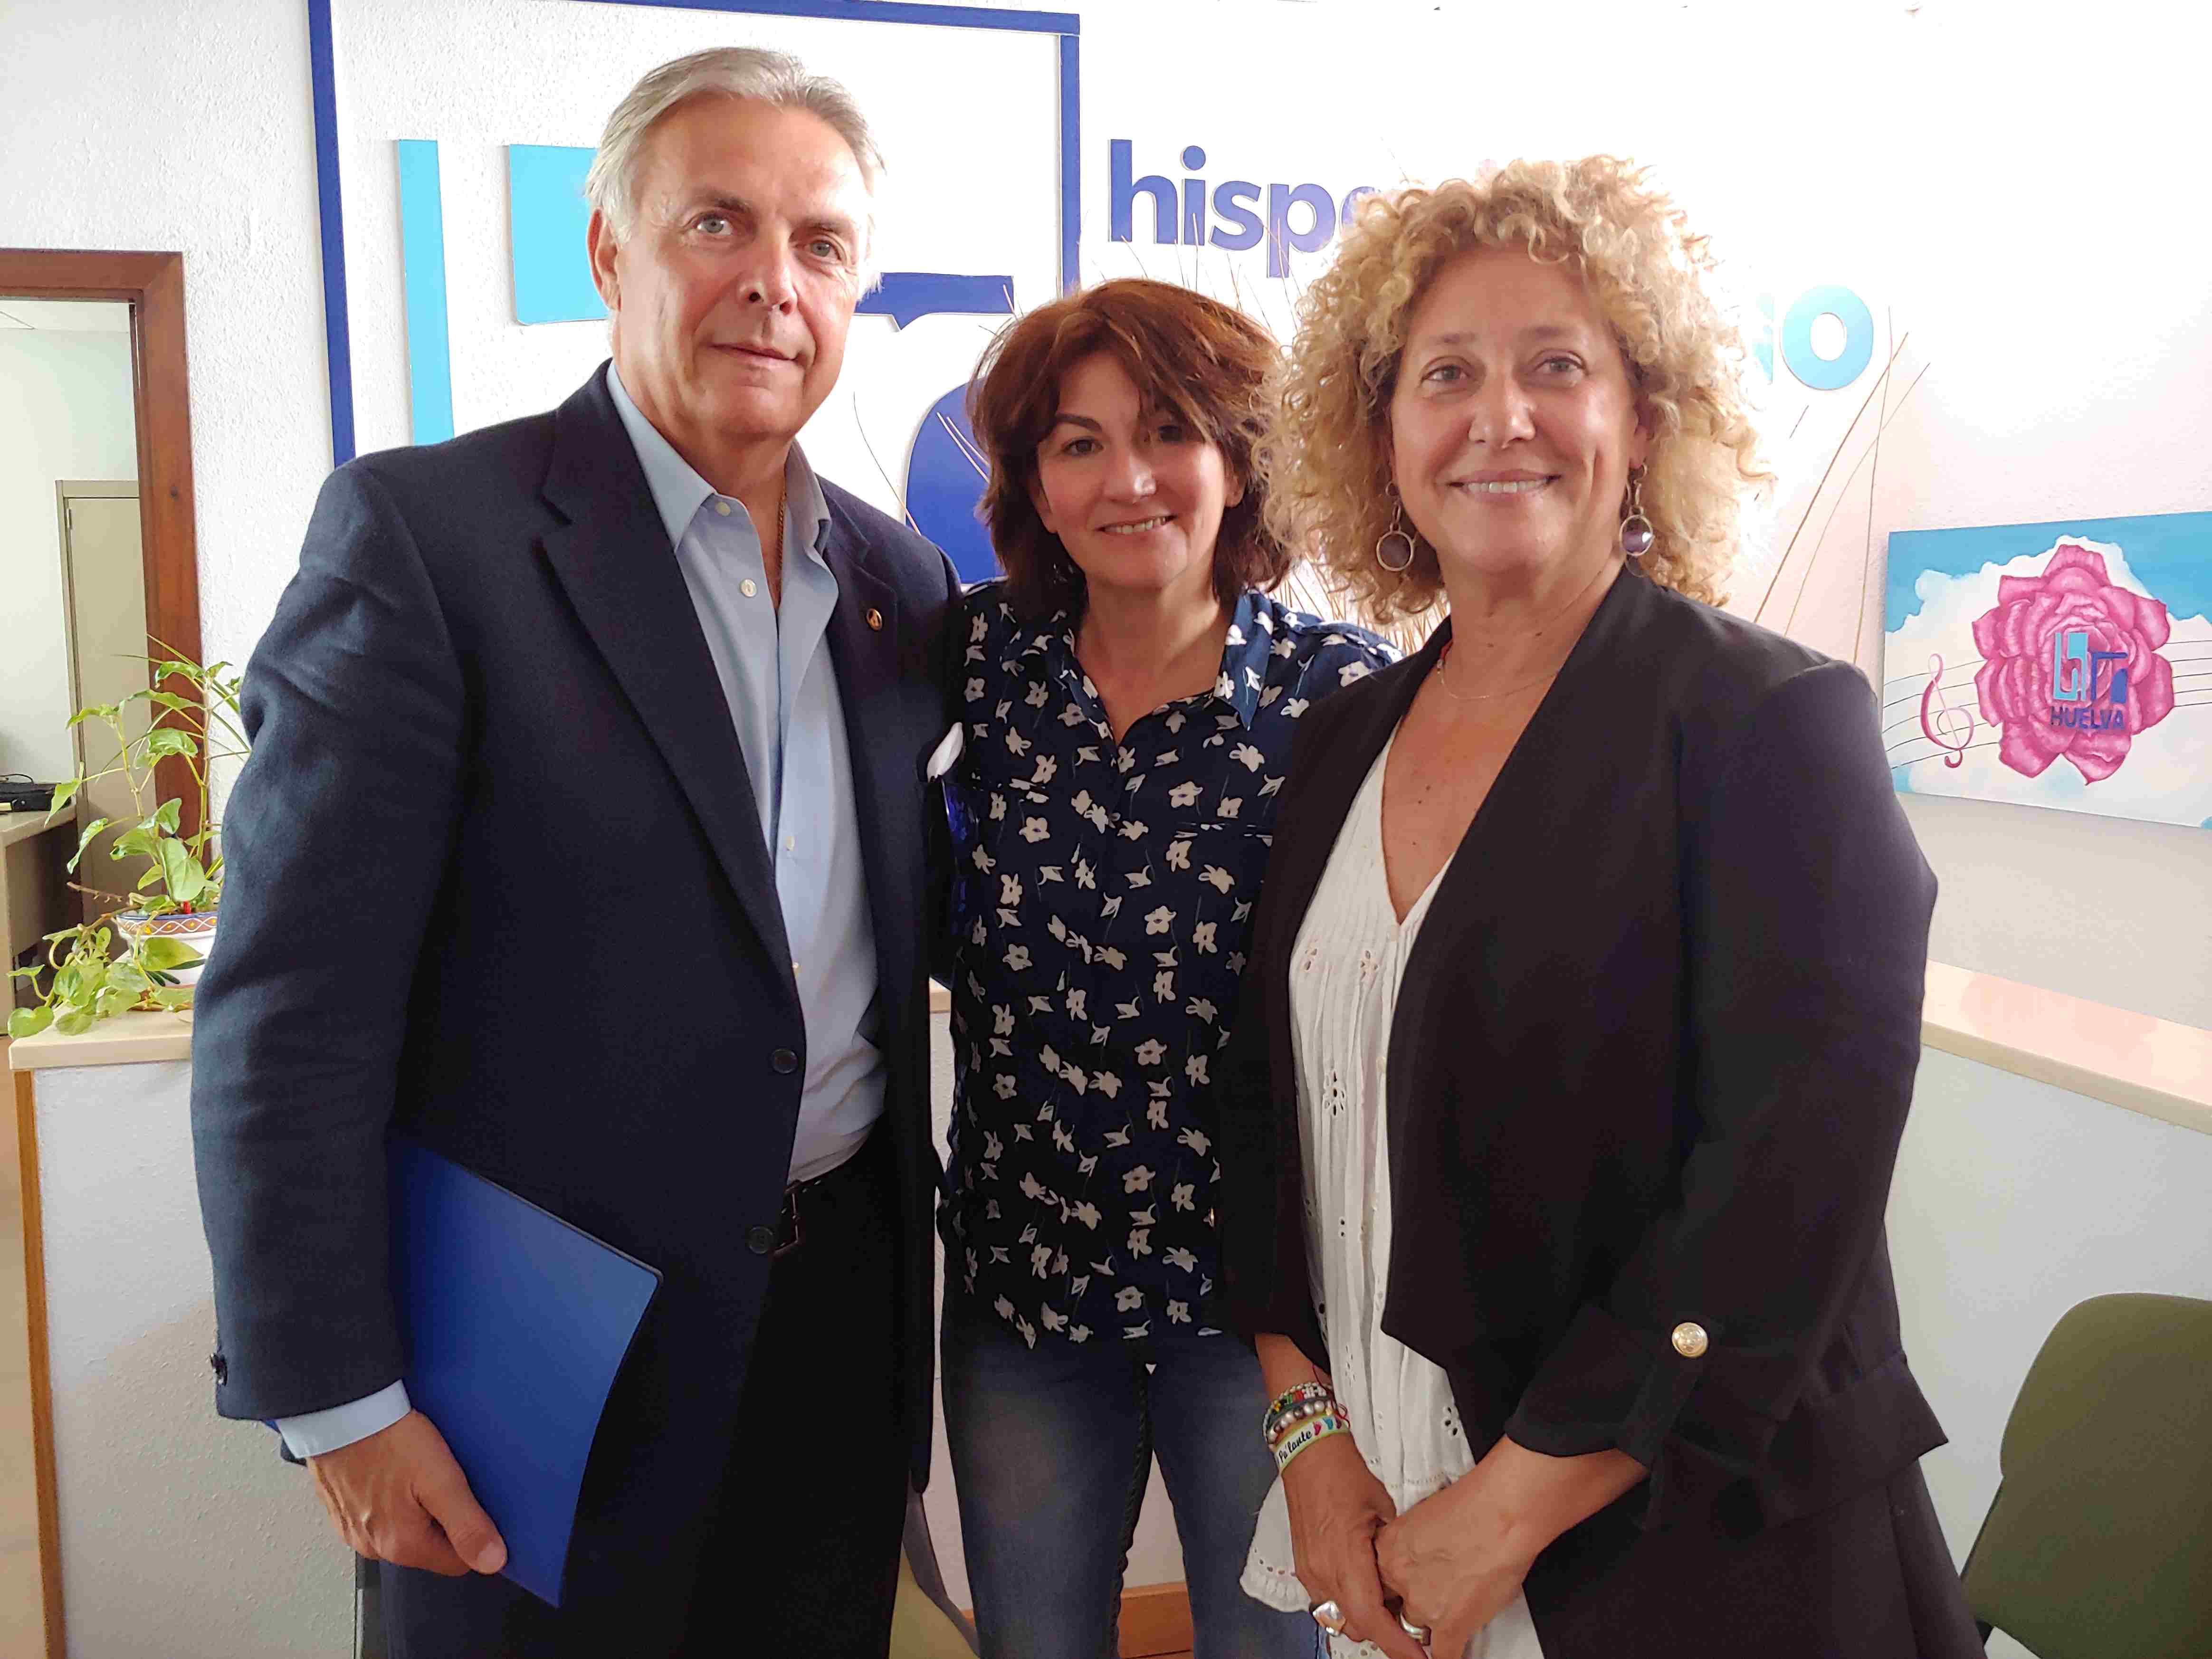 Queremos Saber 08-05-2019 Pilar Marín Candidata PP  Alcaldía Ayuntamiento de Huelva